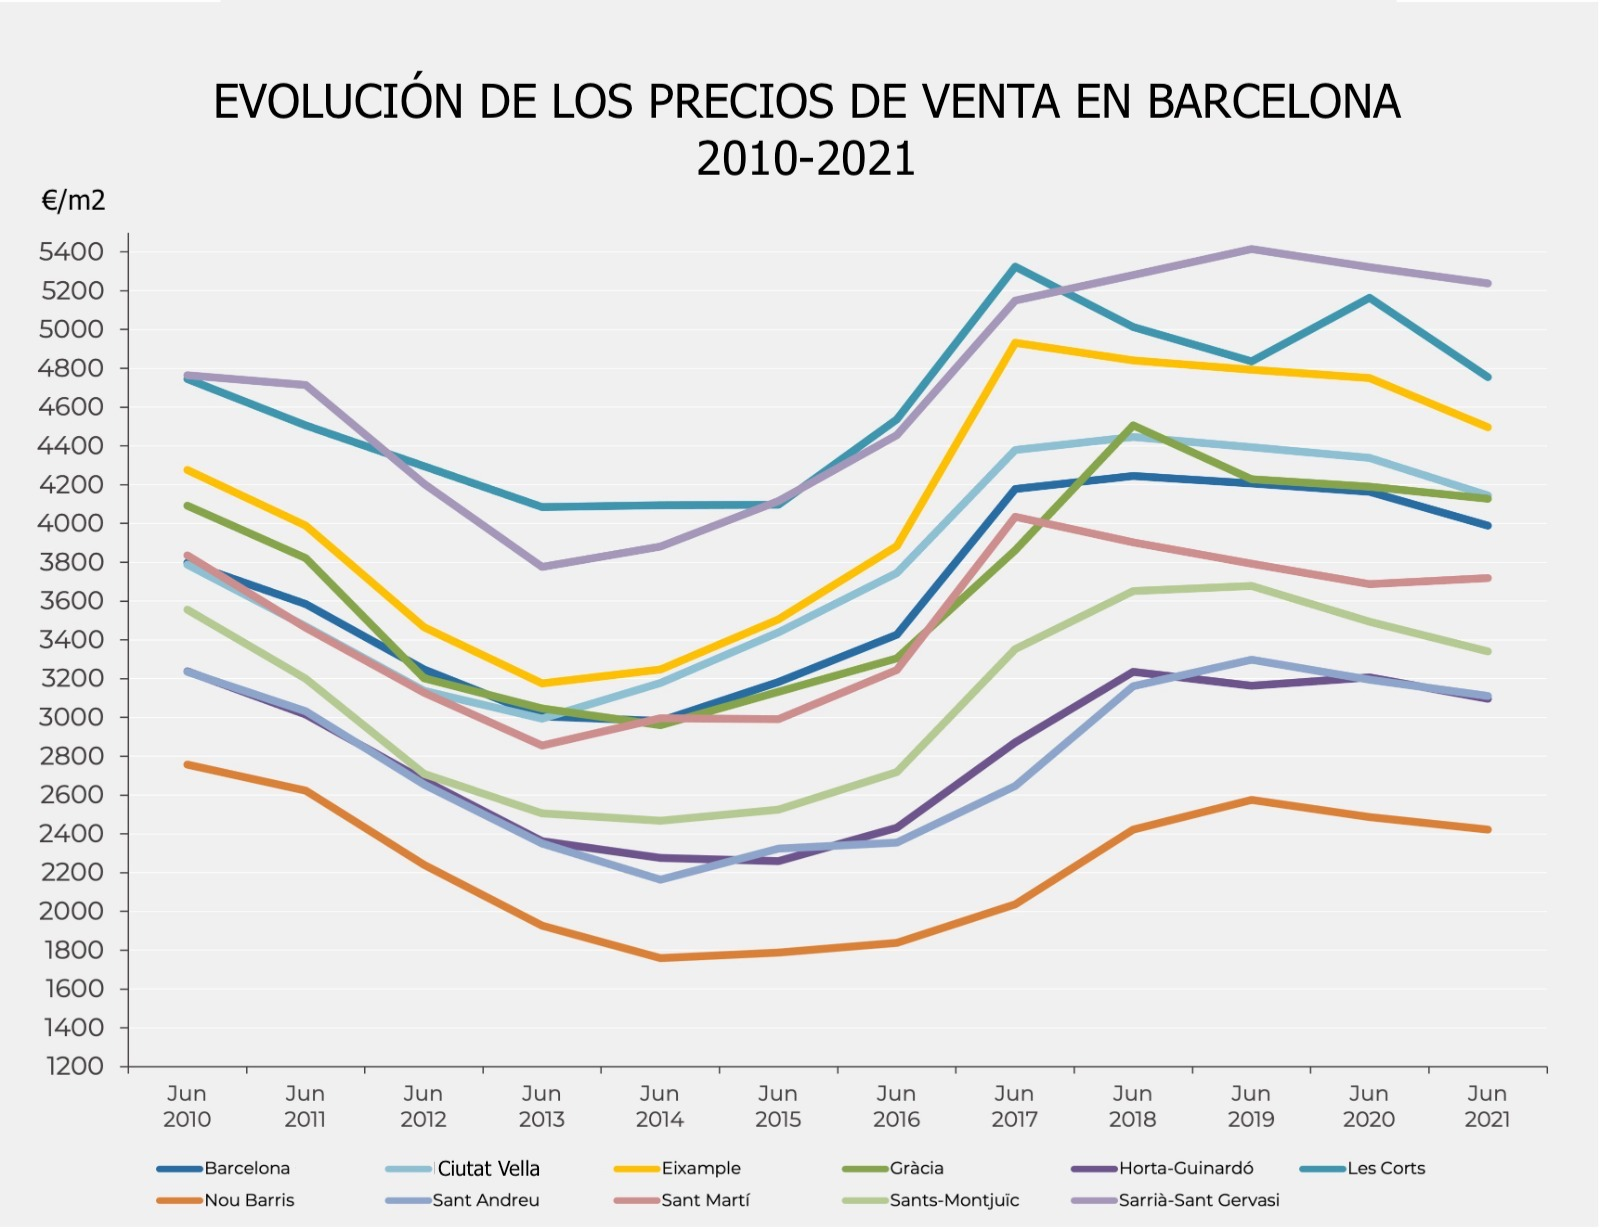 Evolución precios de venta en Barcelona